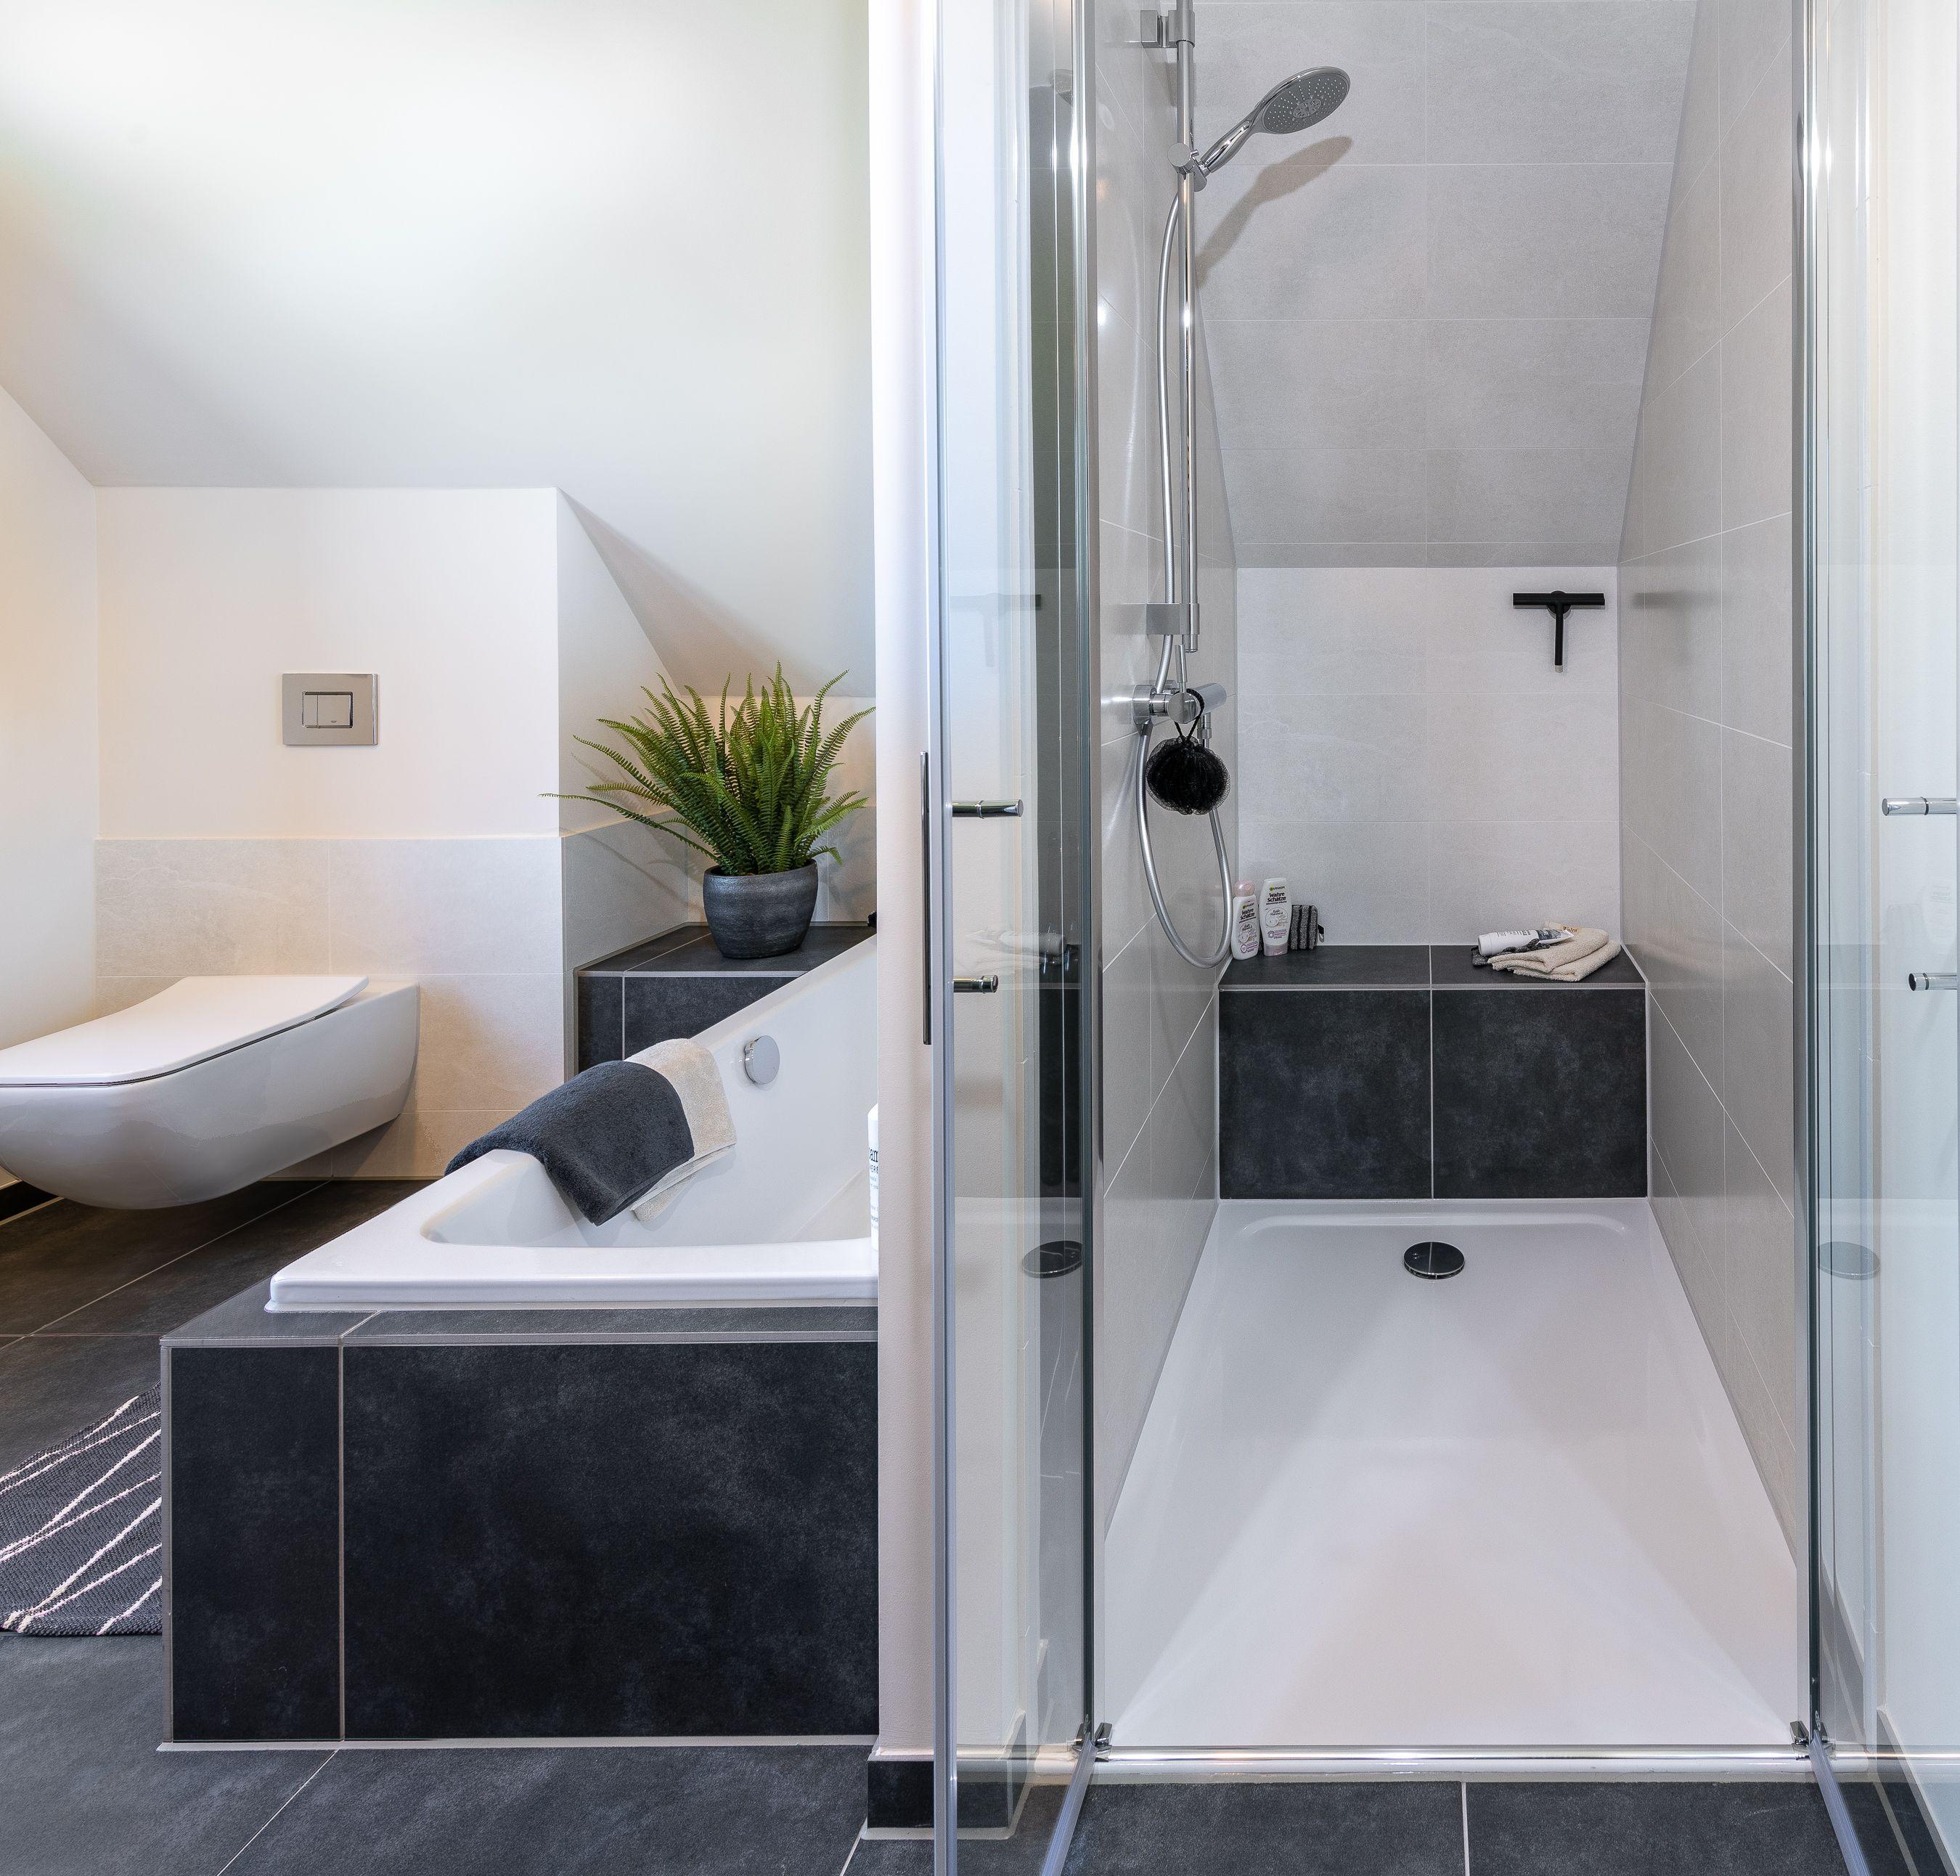 Viebrockhaus Maxime120 Einfamilienhaus Bad Badezimmer Furnishings Diy House Styles Modern Chic